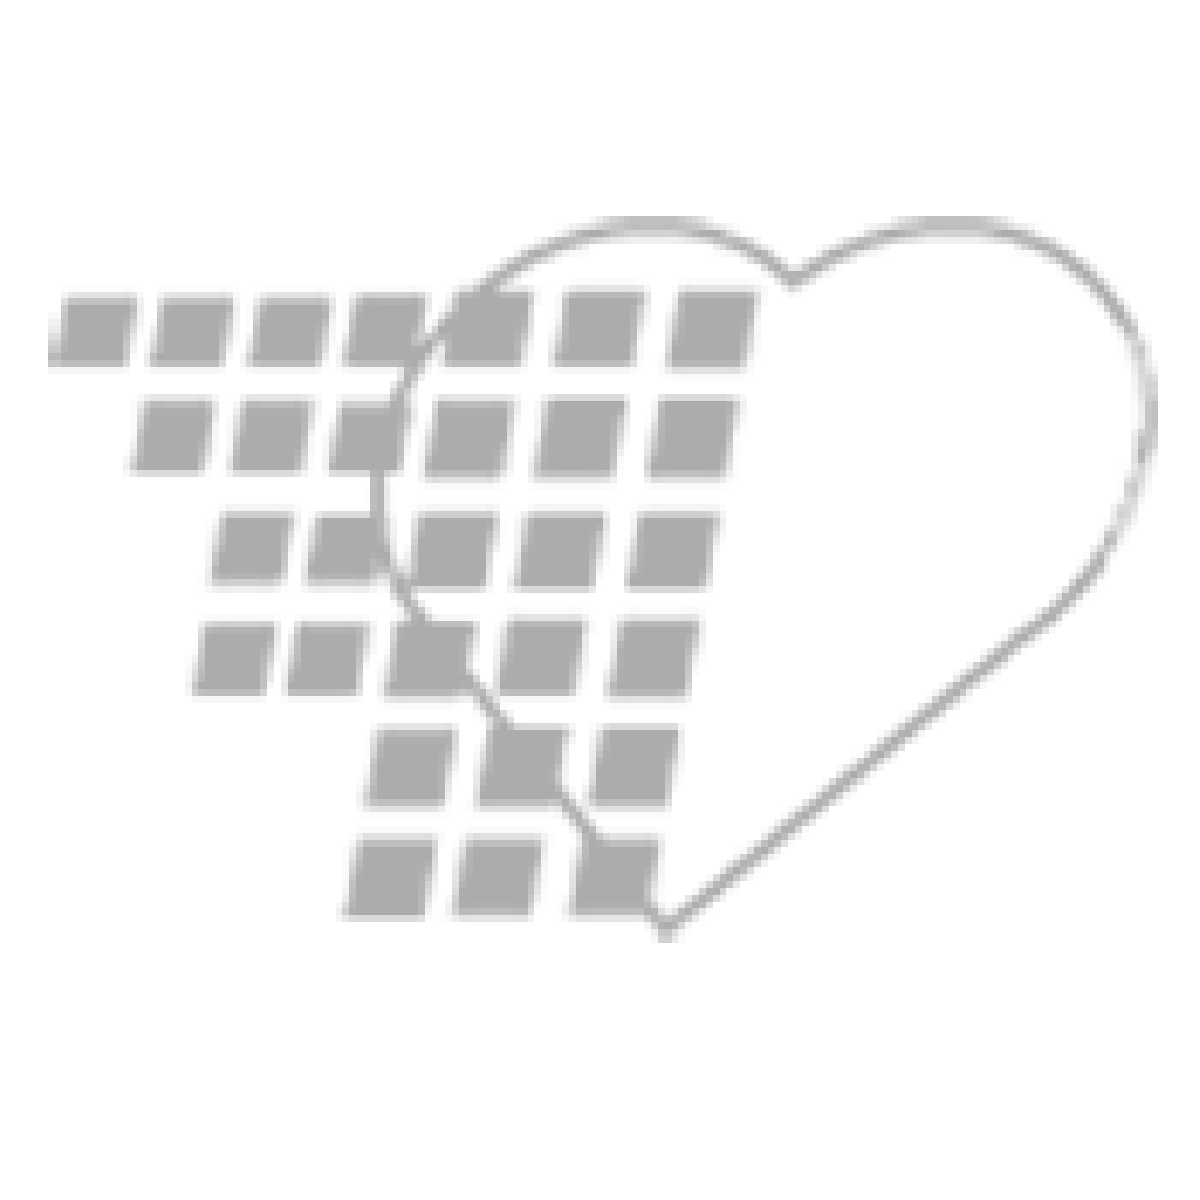 06-93-1439 - Demo Dose® Vancomycn 20 mL 1 g/20 mL